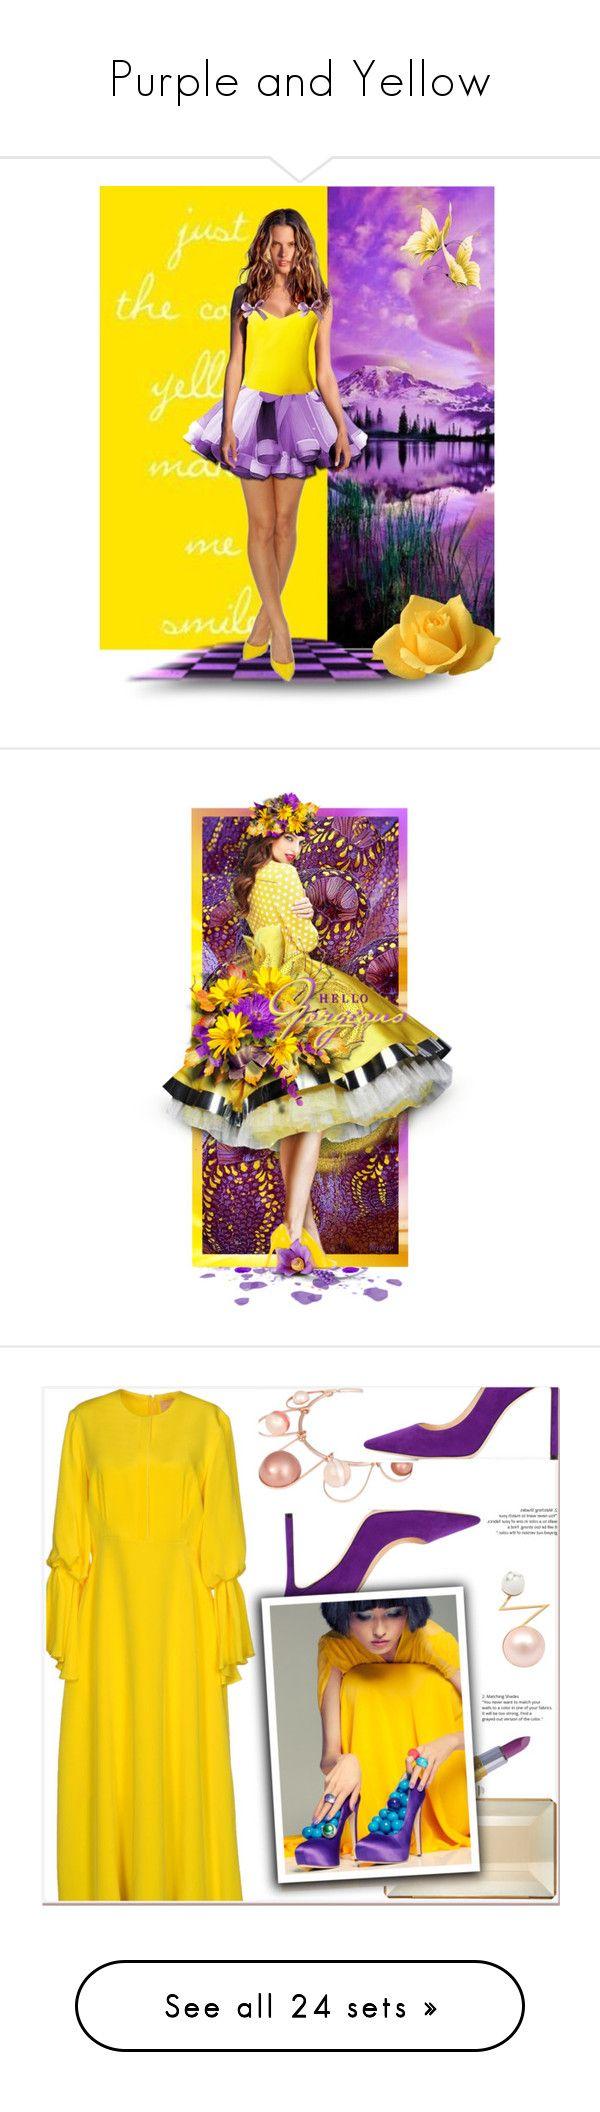 """Purple and Yellow"" by karen-galves on Polyvore featuring art, contestentry, Jimmy Choo, Roksanda, Winky Lux, Judith Leiber, LeiVanKash, yellow, purple and yellowdress"